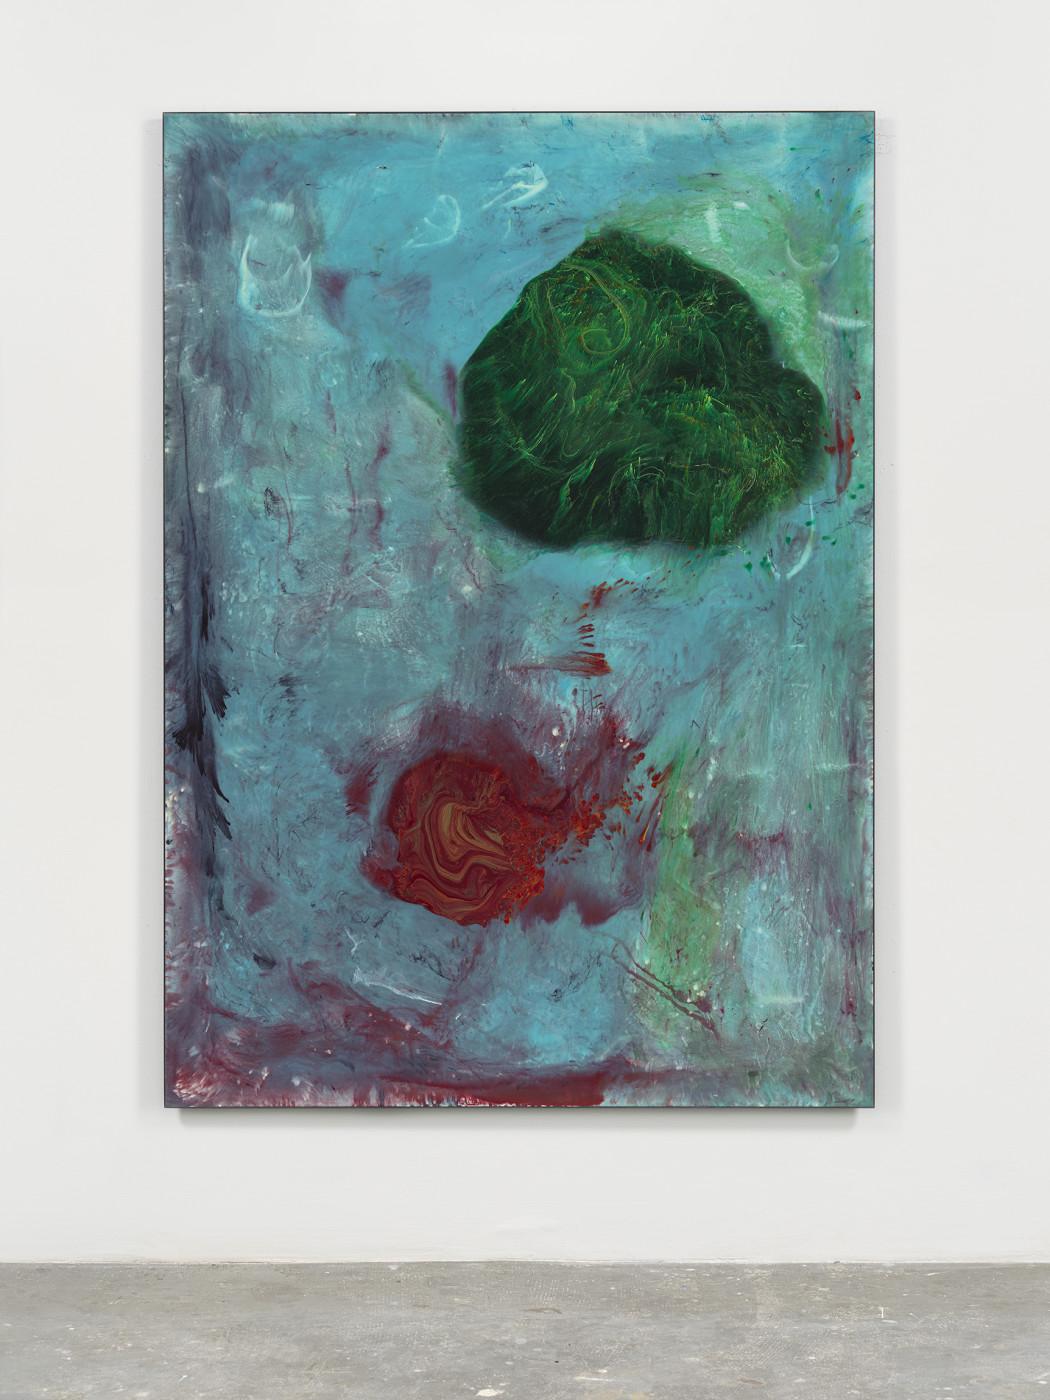 <p><i>Blue Painting</i></p><p><span>2019</span><br /><span>Cast urethane resin, fiberglass, epoxy</span><br /><span>84.25 x 60.25 in</span></p>